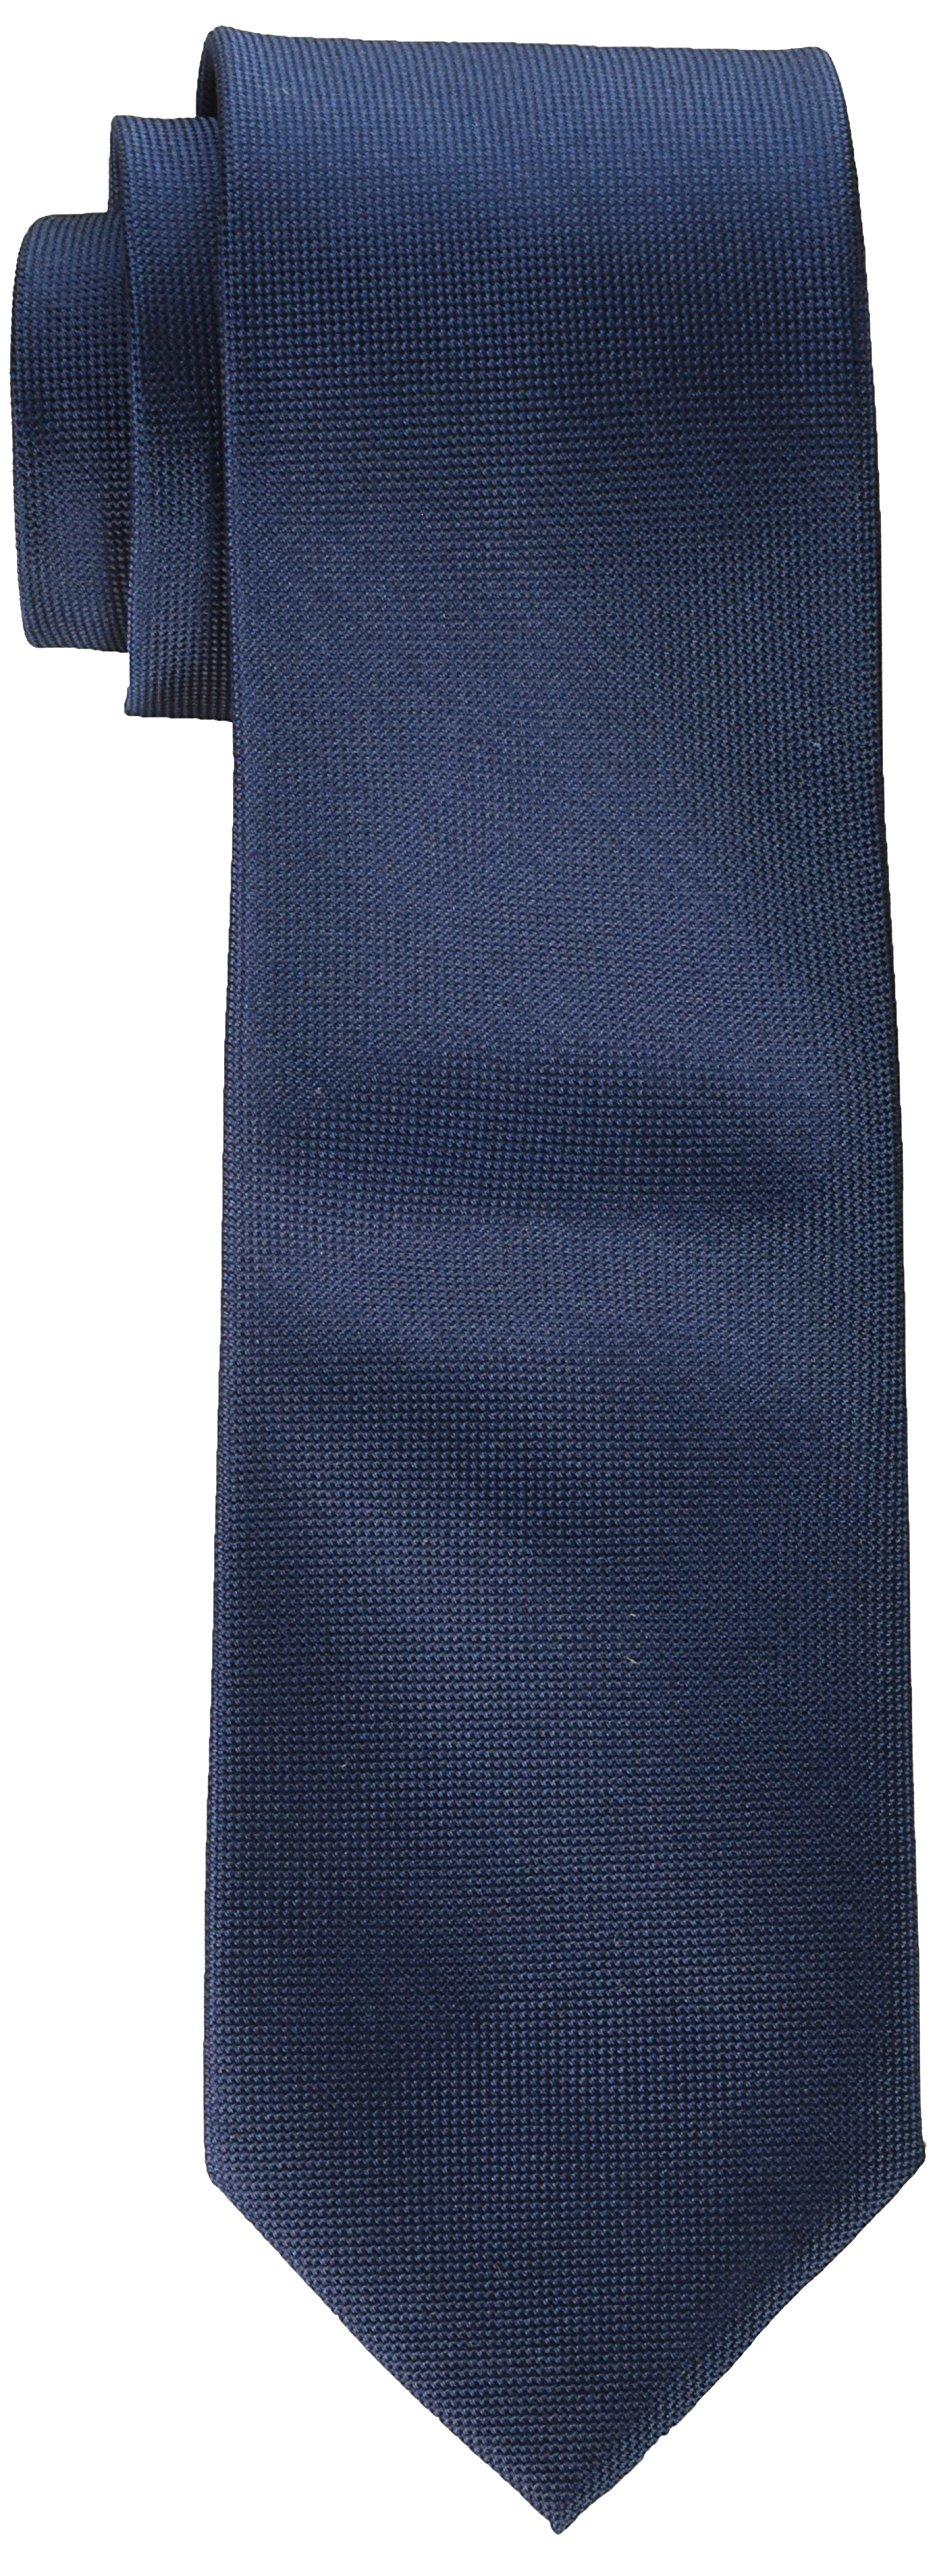 Calvin Klein Men's Oxford Solid Tie, Navy, Regular